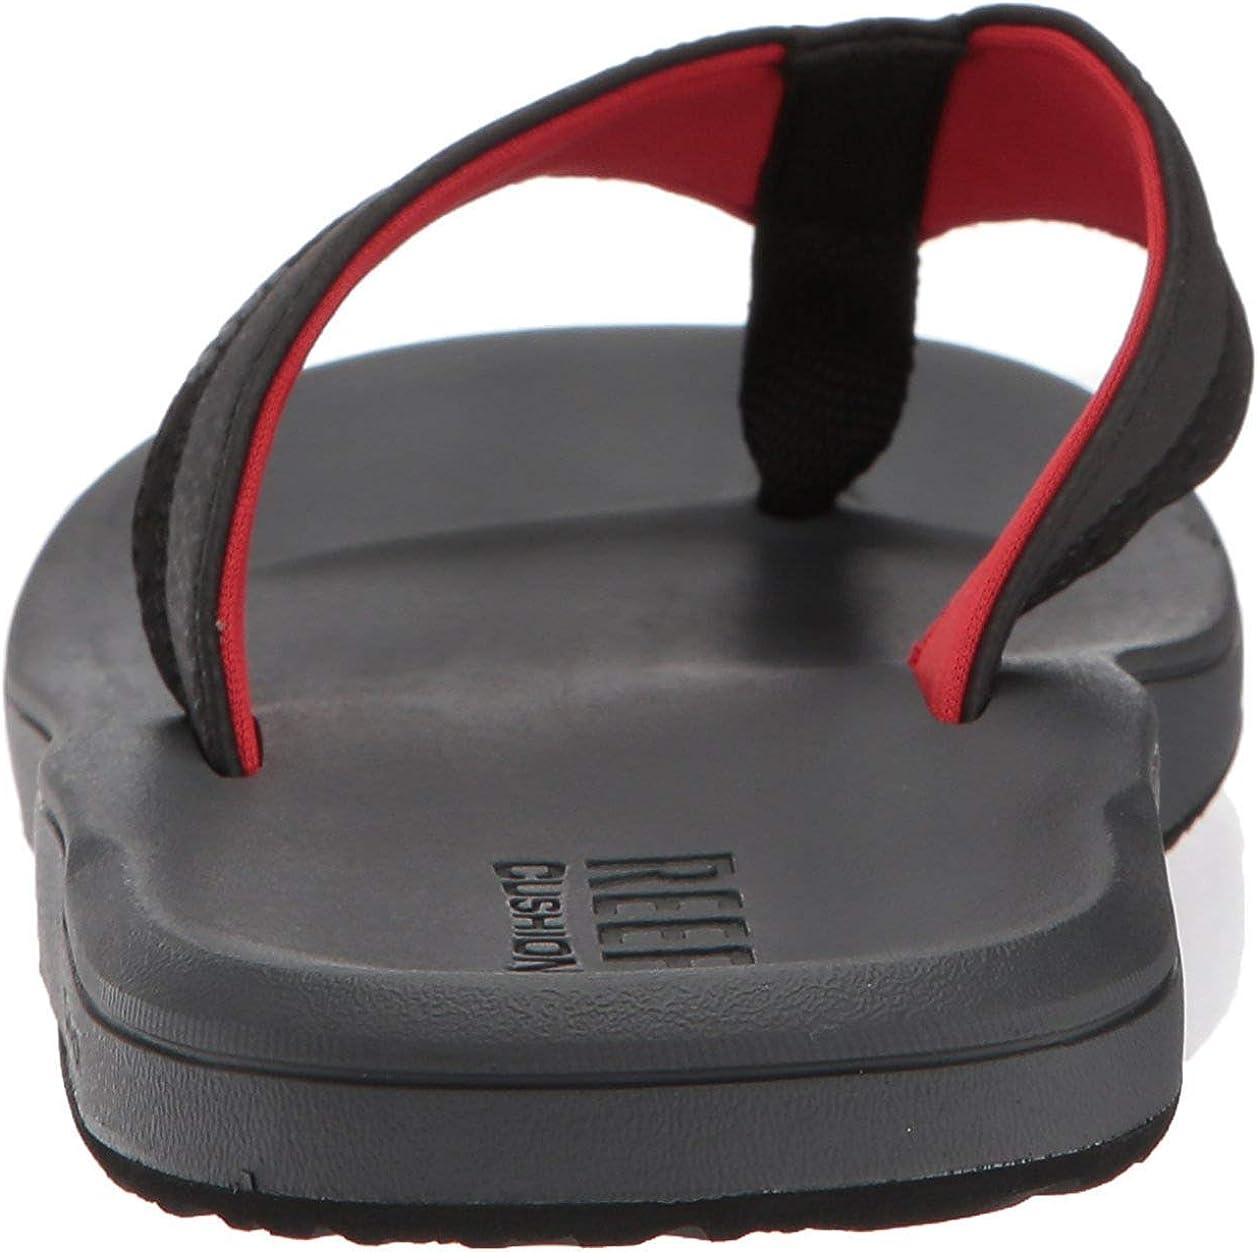 REEF Mens Contoured Cushion Flip-Flop